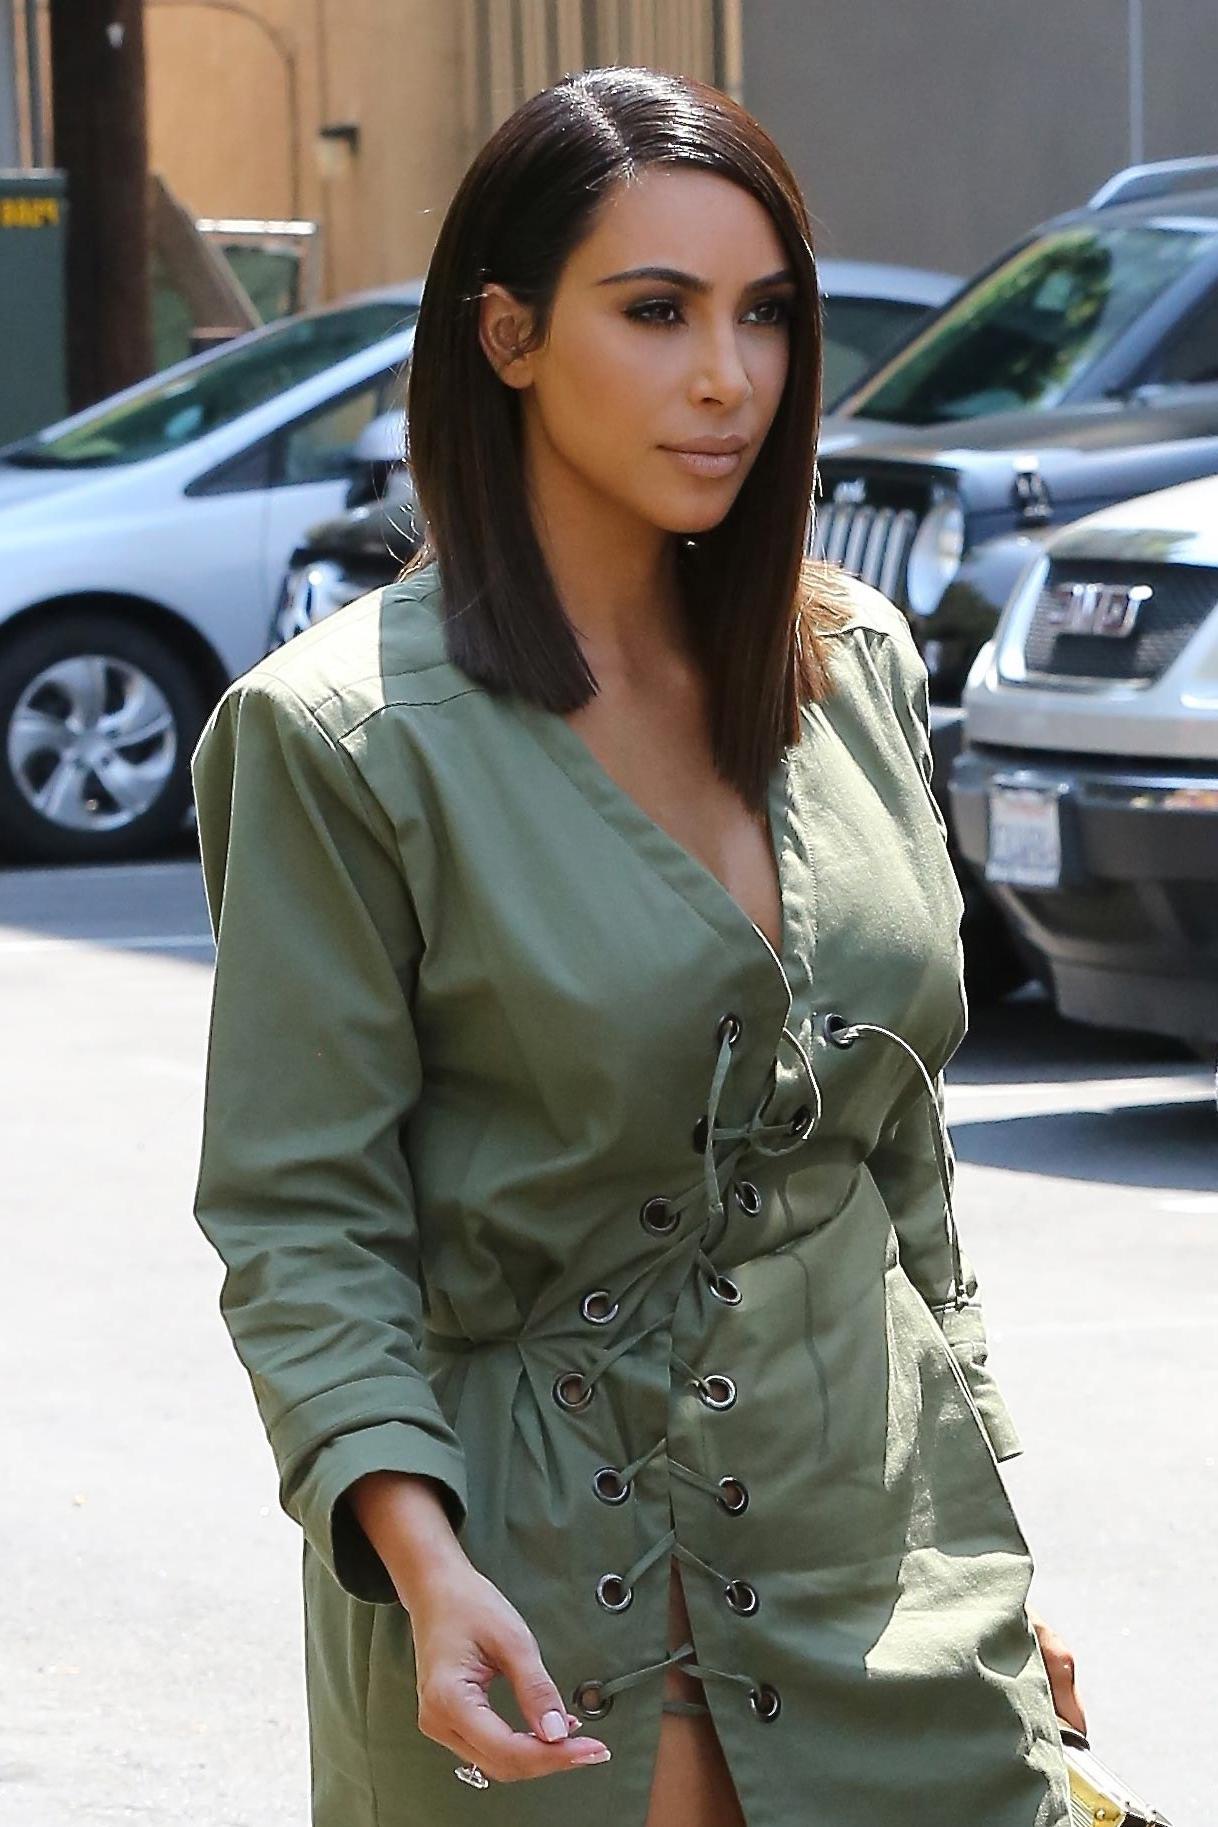 Kim Kardashian West Goes For The Blunt Bob – Vogue Inside Kim Kardashian Short Haircuts (View 10 of 25)